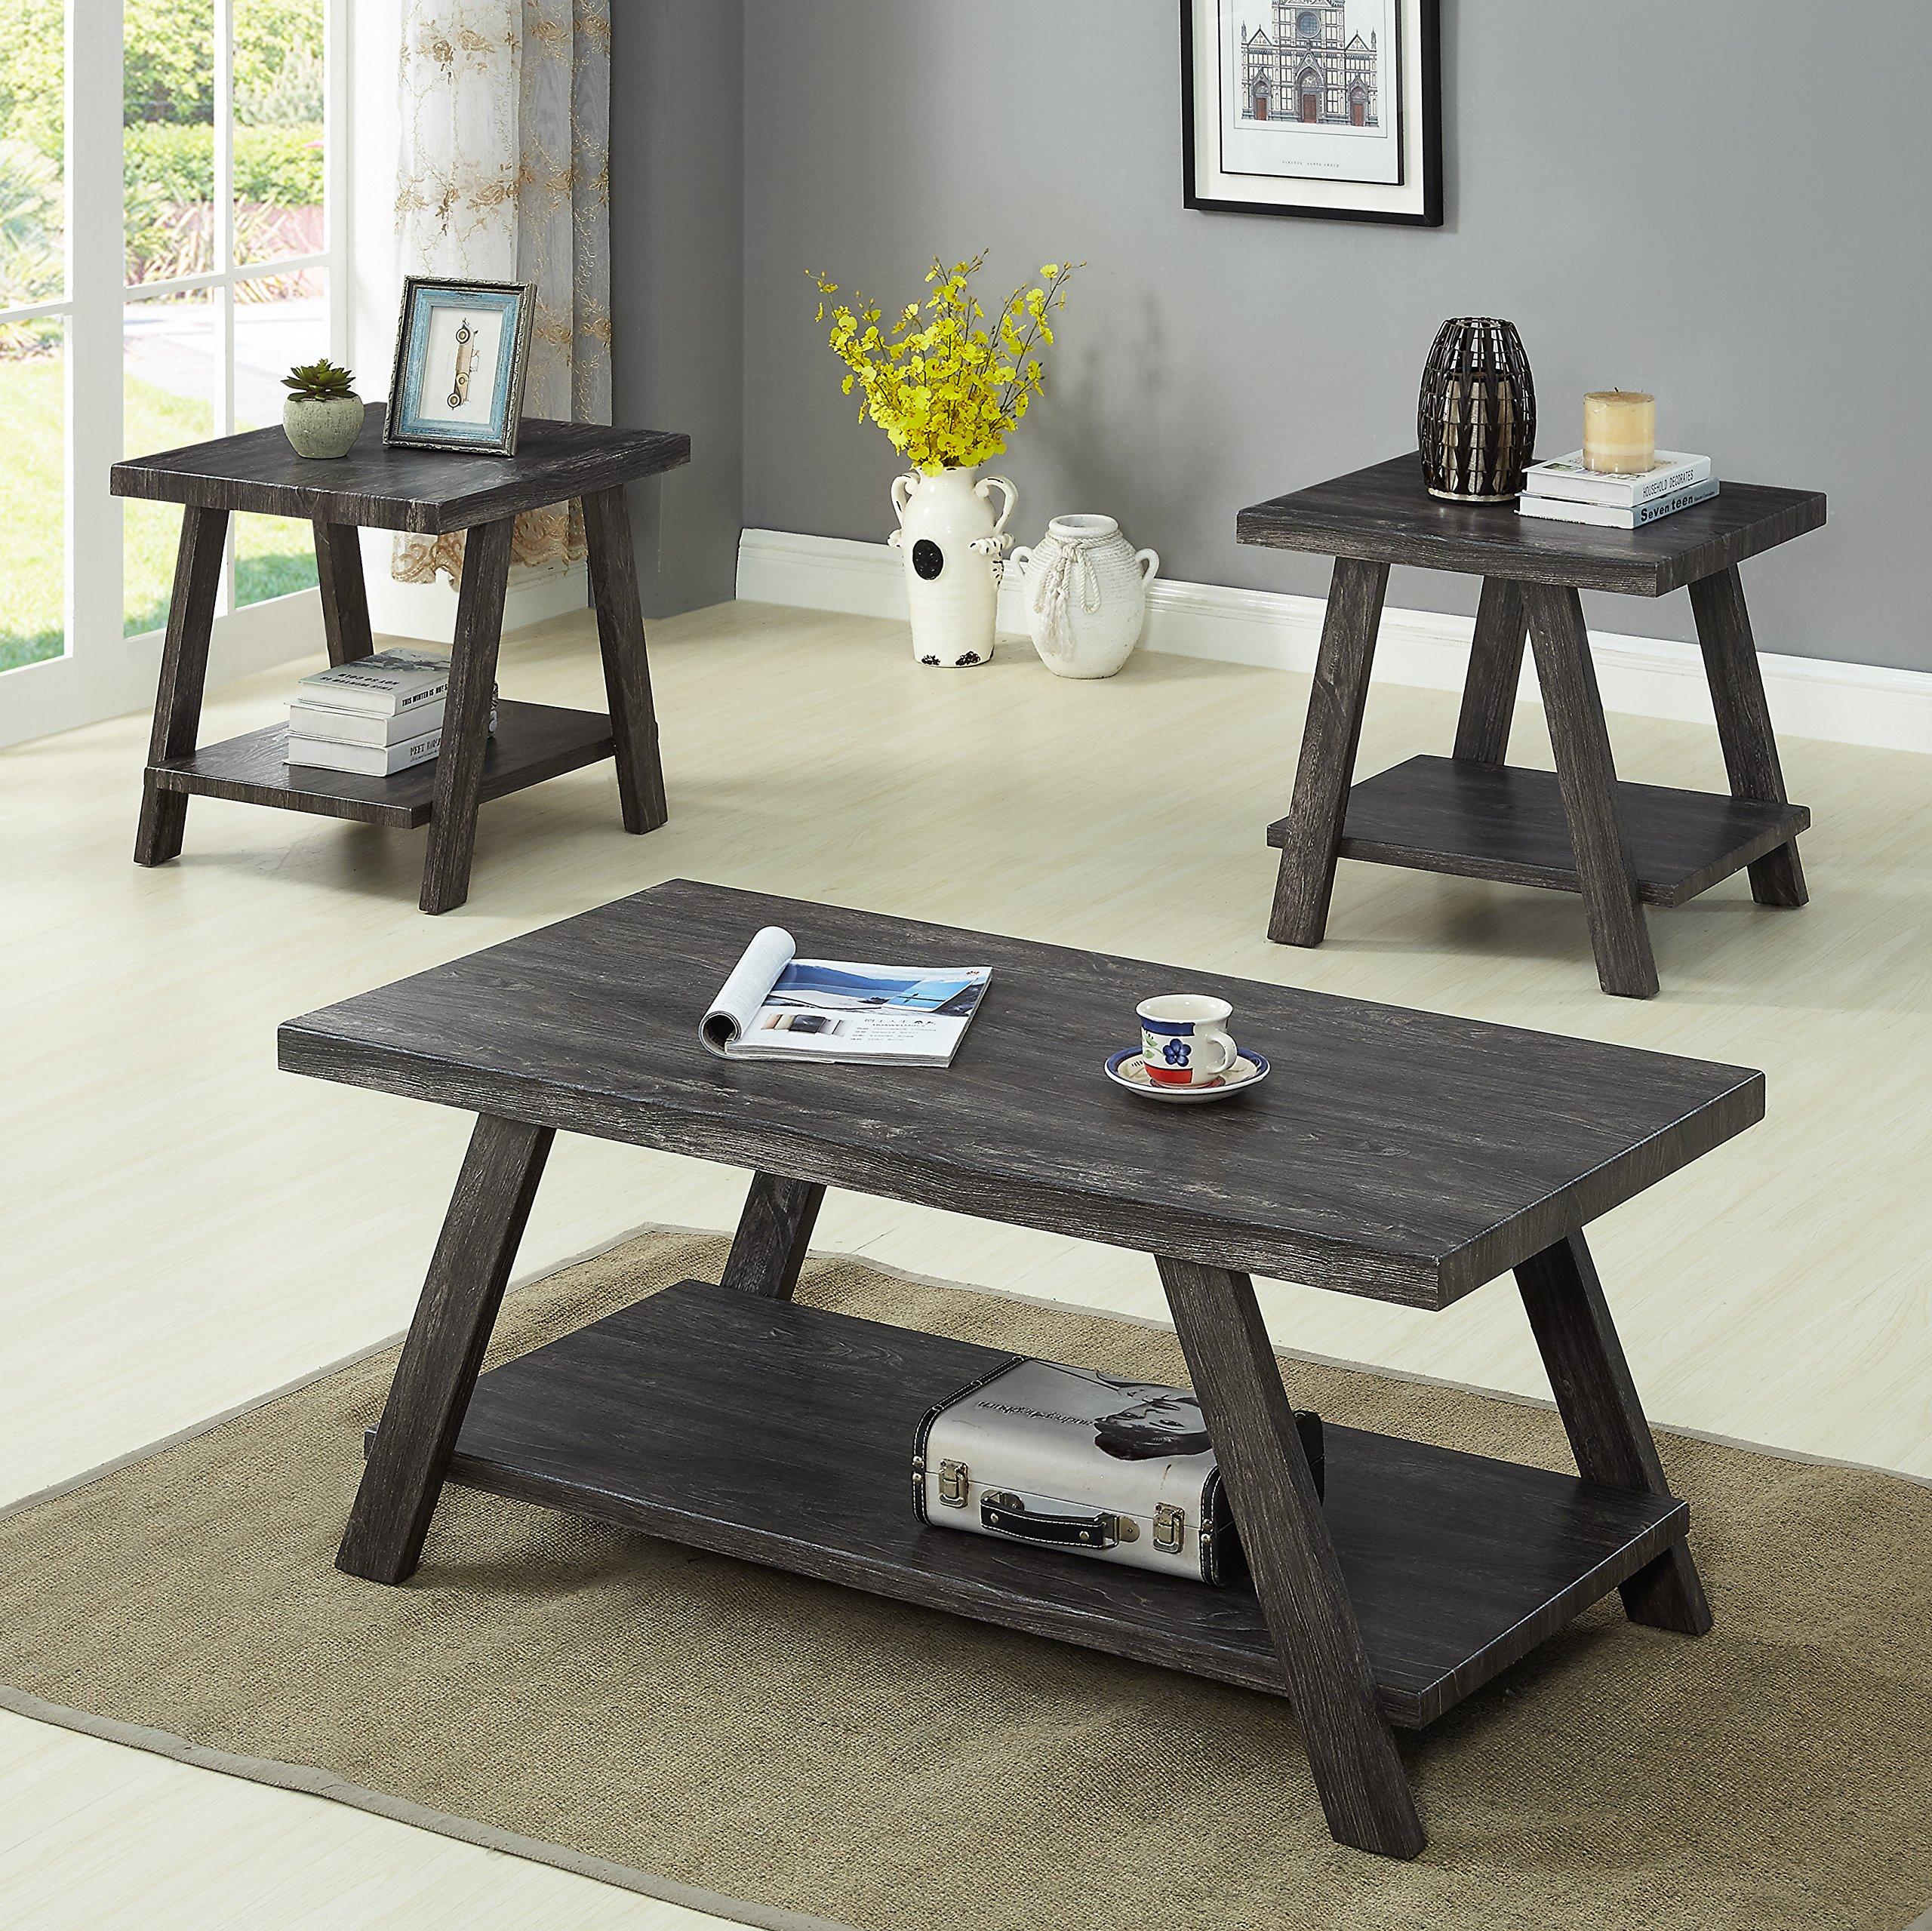 Roundhill Furniture OS3371 Athens, Coffee Table Set, Grey